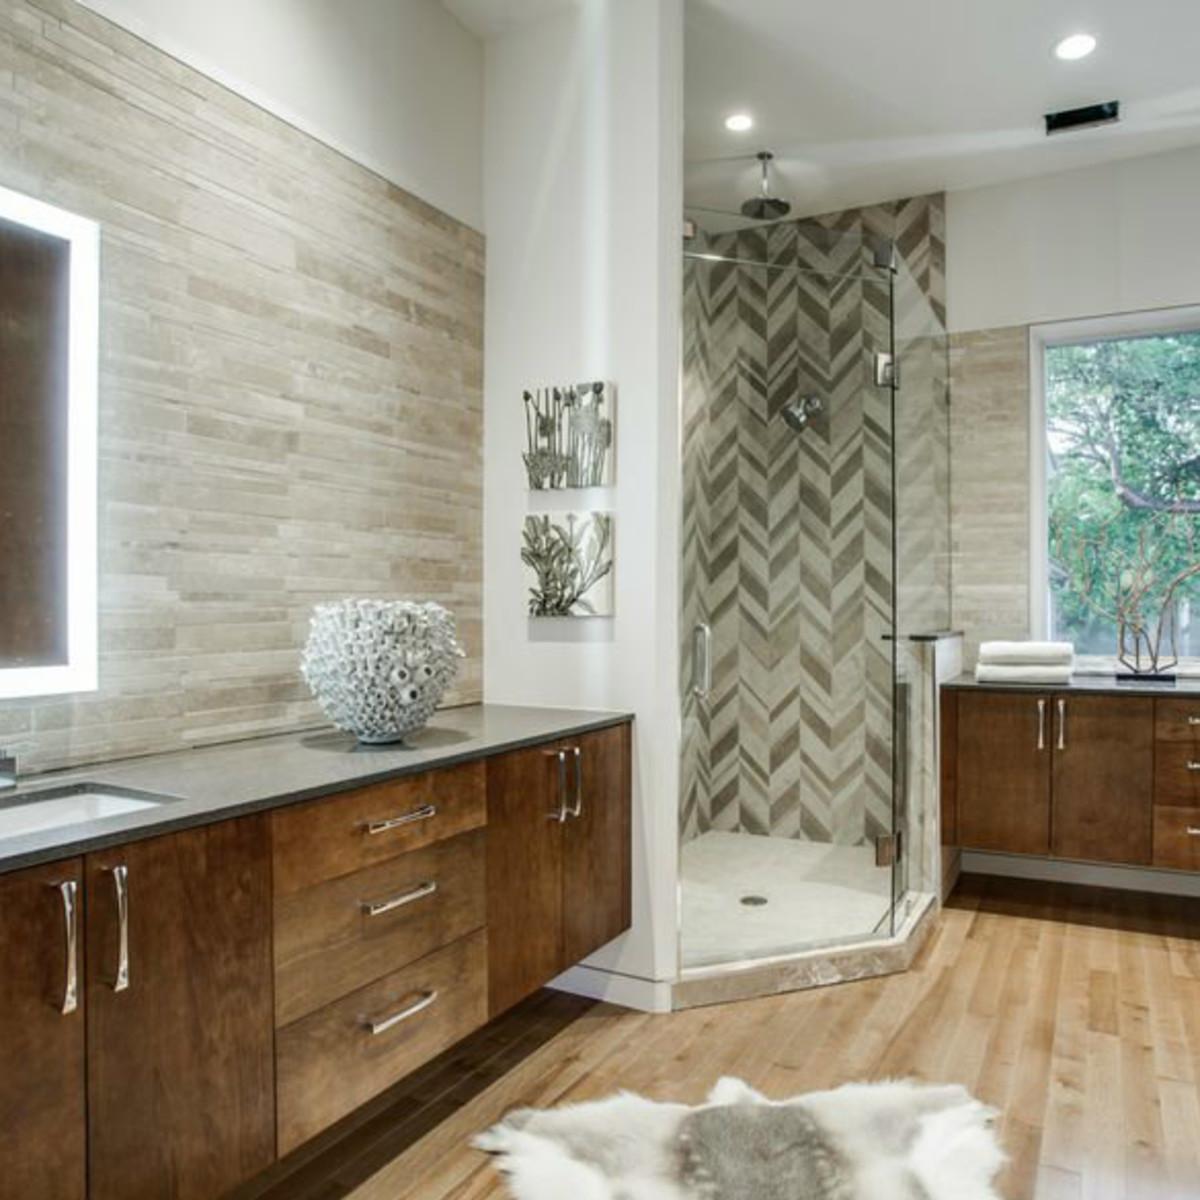 4428 Greenbrier master bathroom